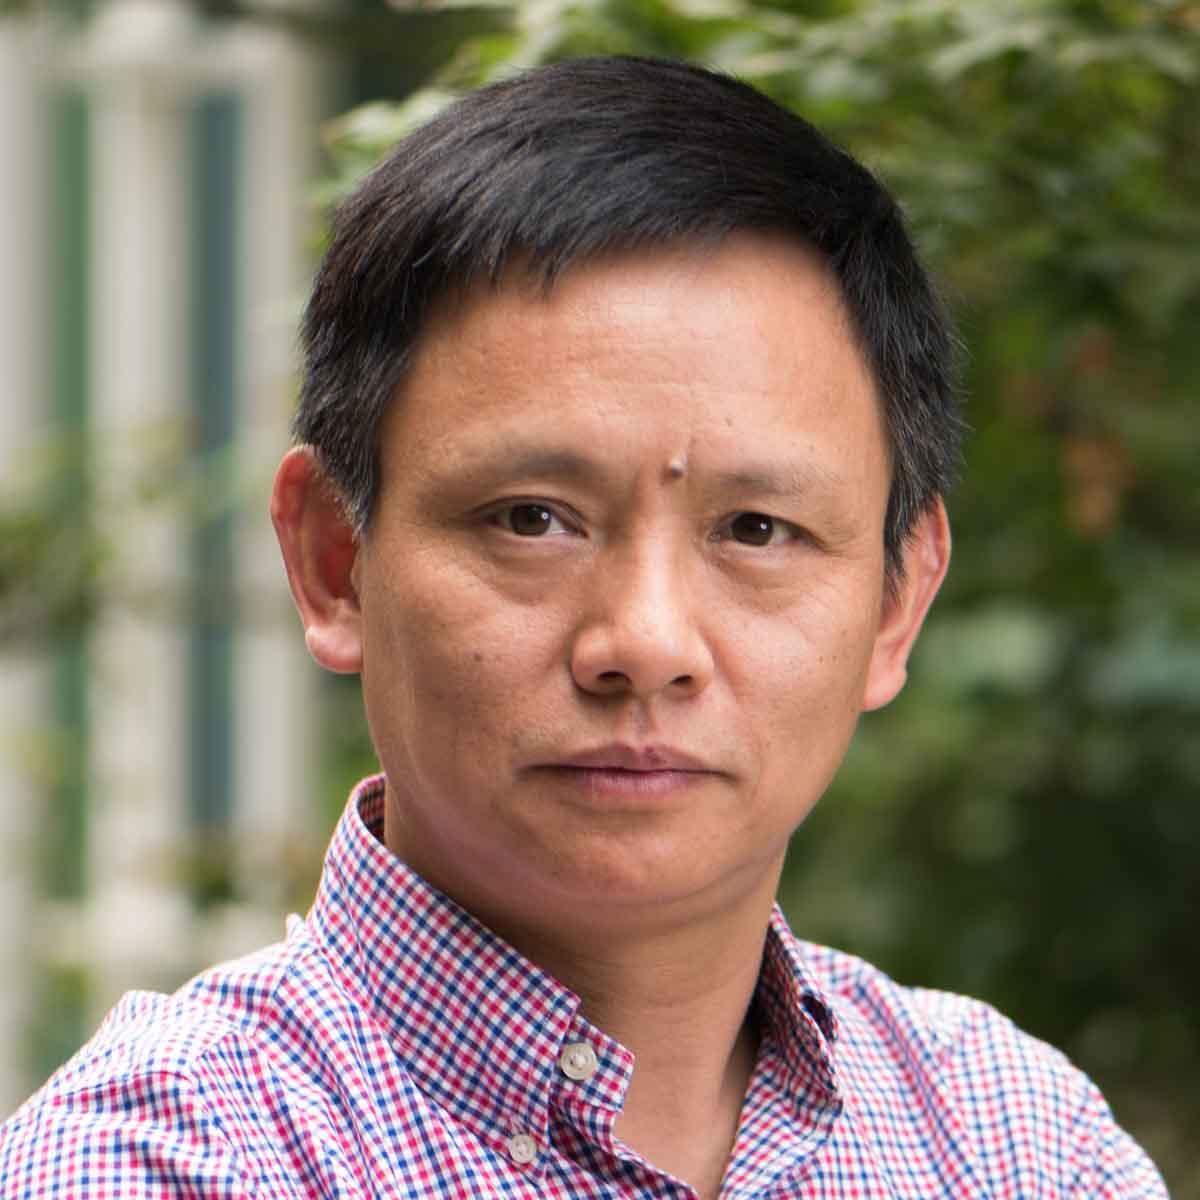 Xiao portrait